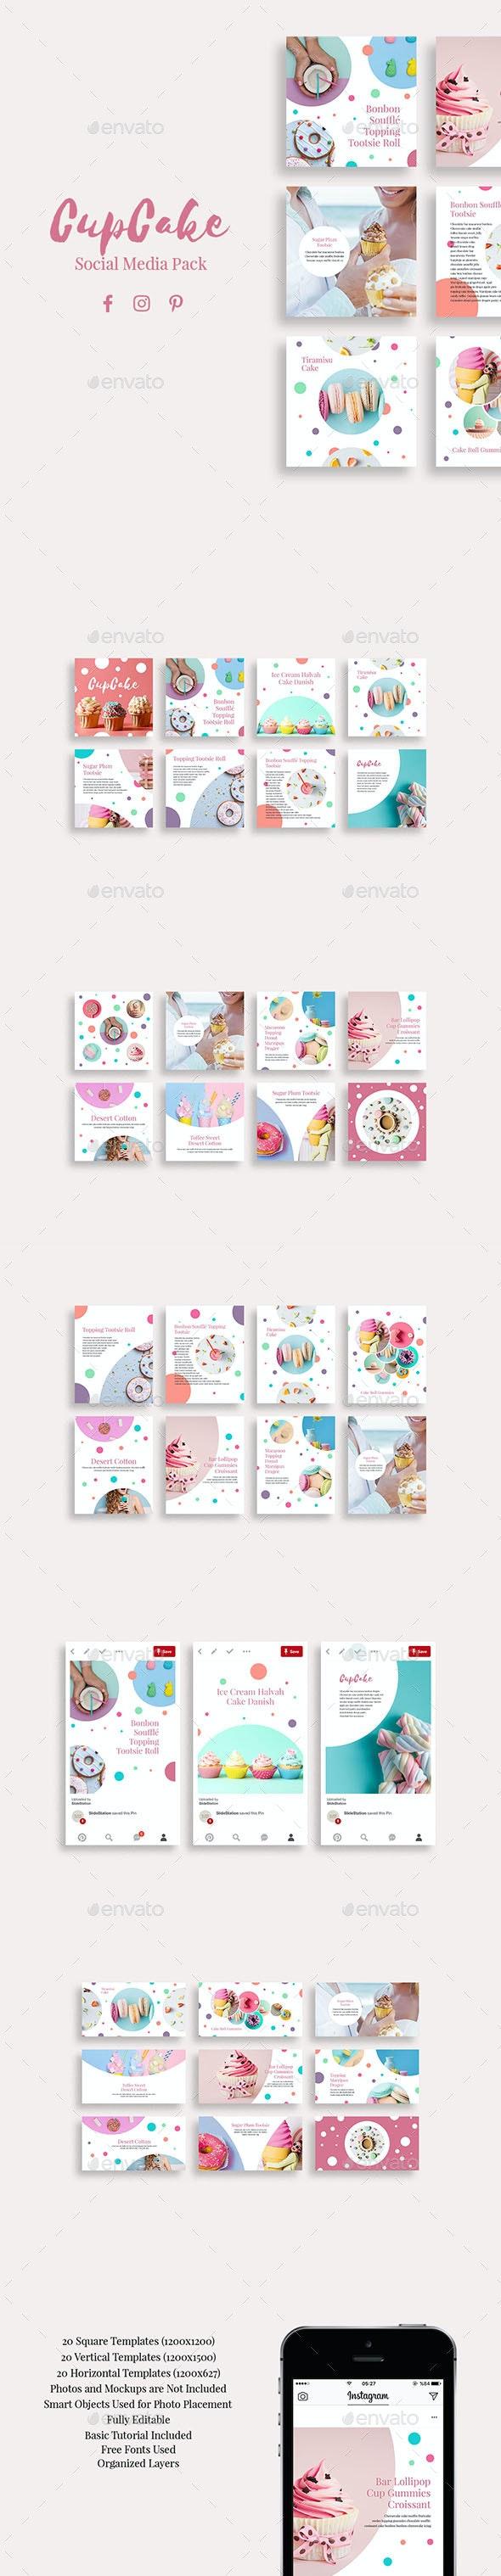 CupCake Social Media Pack - Social Media Web Elements